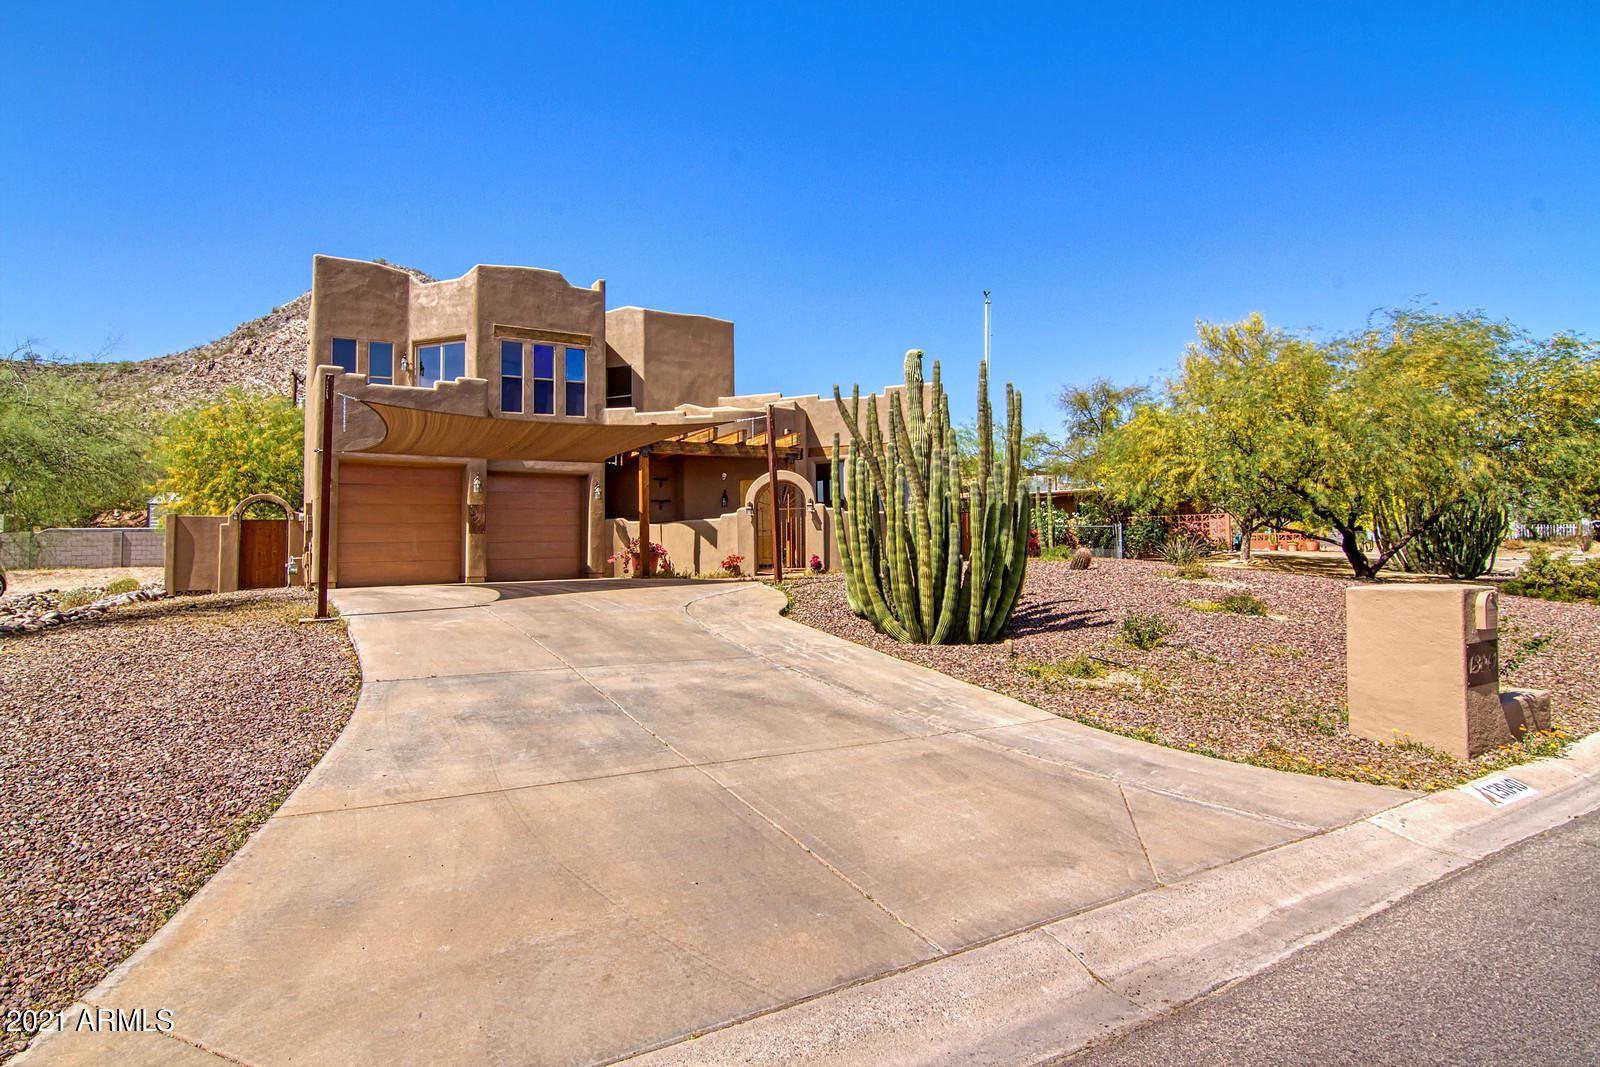 13040 N VICTOR HUGO Avenue, Phoenix, AZ 85032 - MLS#: 6225621